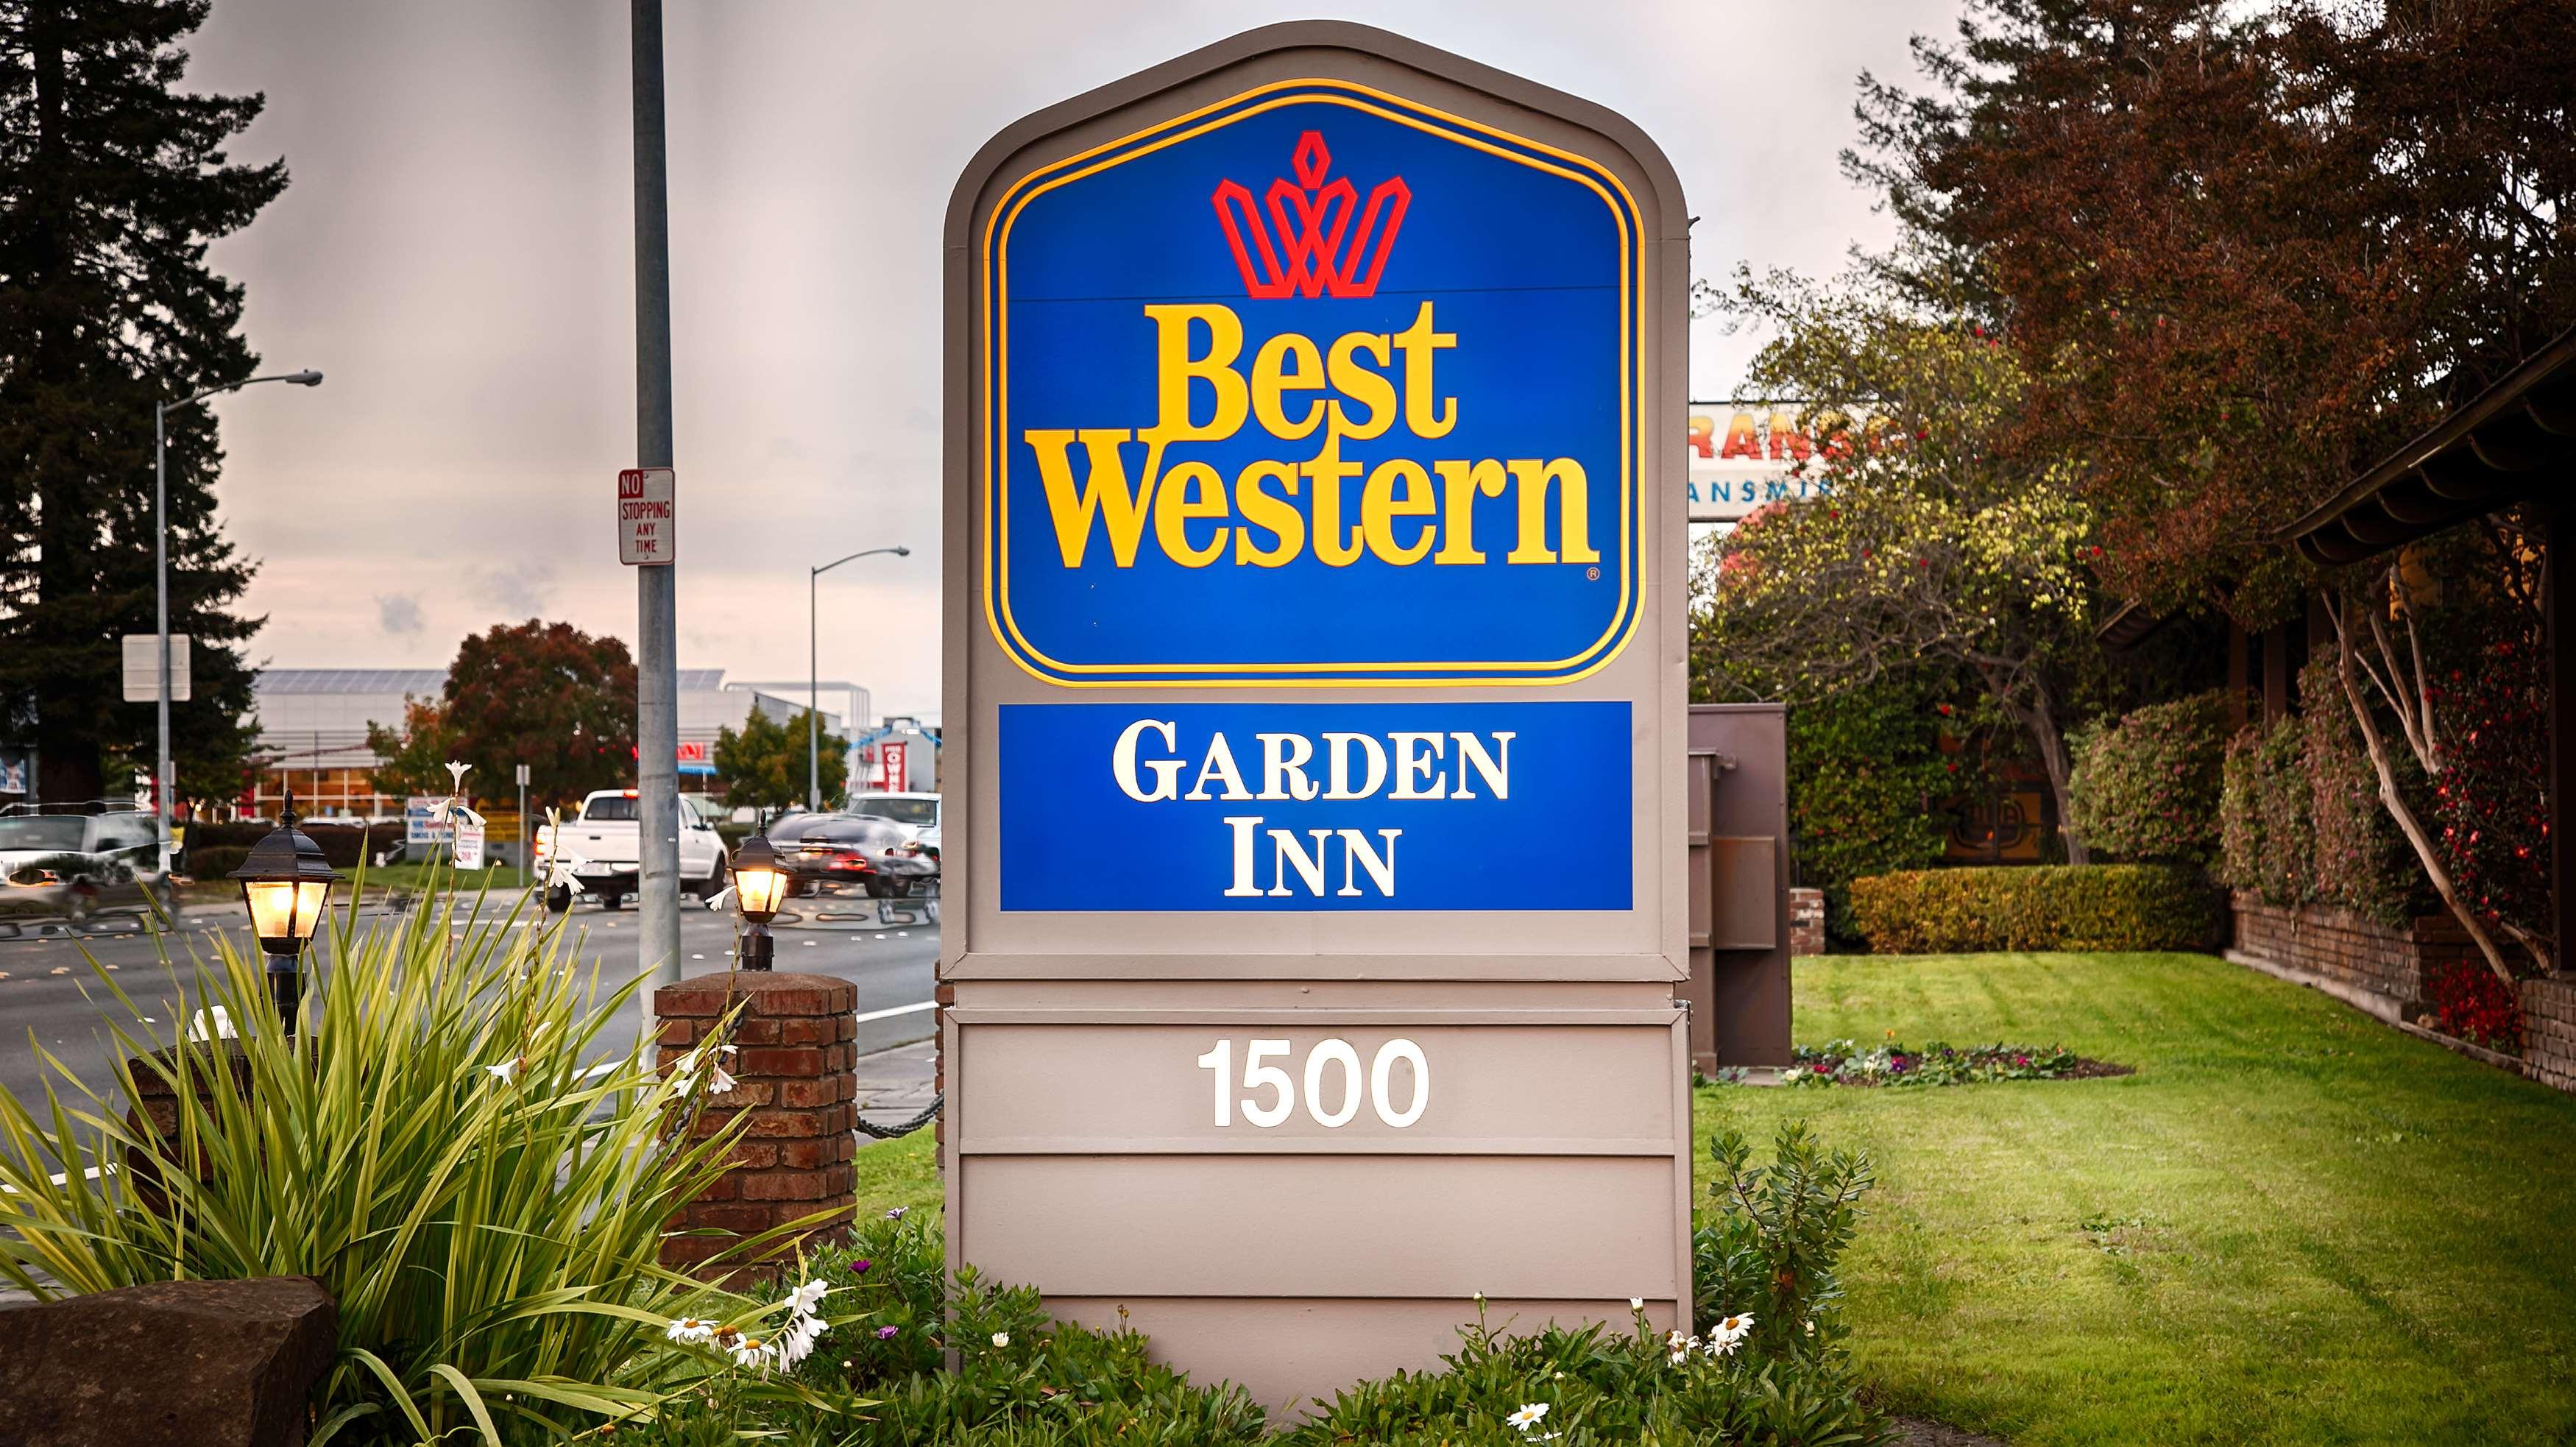 Best Western Garden Inn Santa Rosa Ca Business Directory